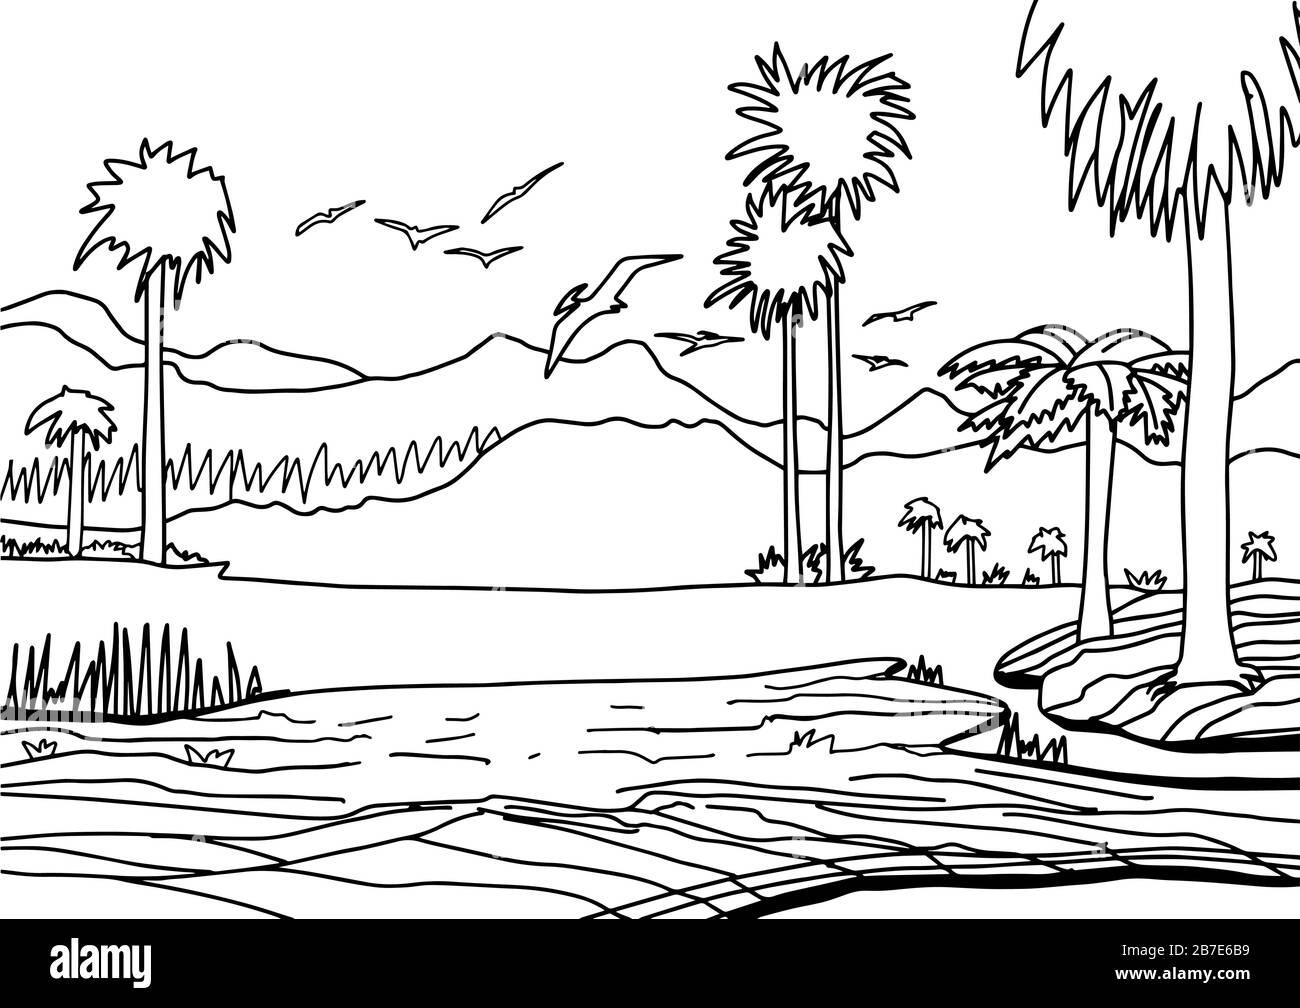 Dibujo Prehistoria Para Colorear Imagenes De Stock Dibujo